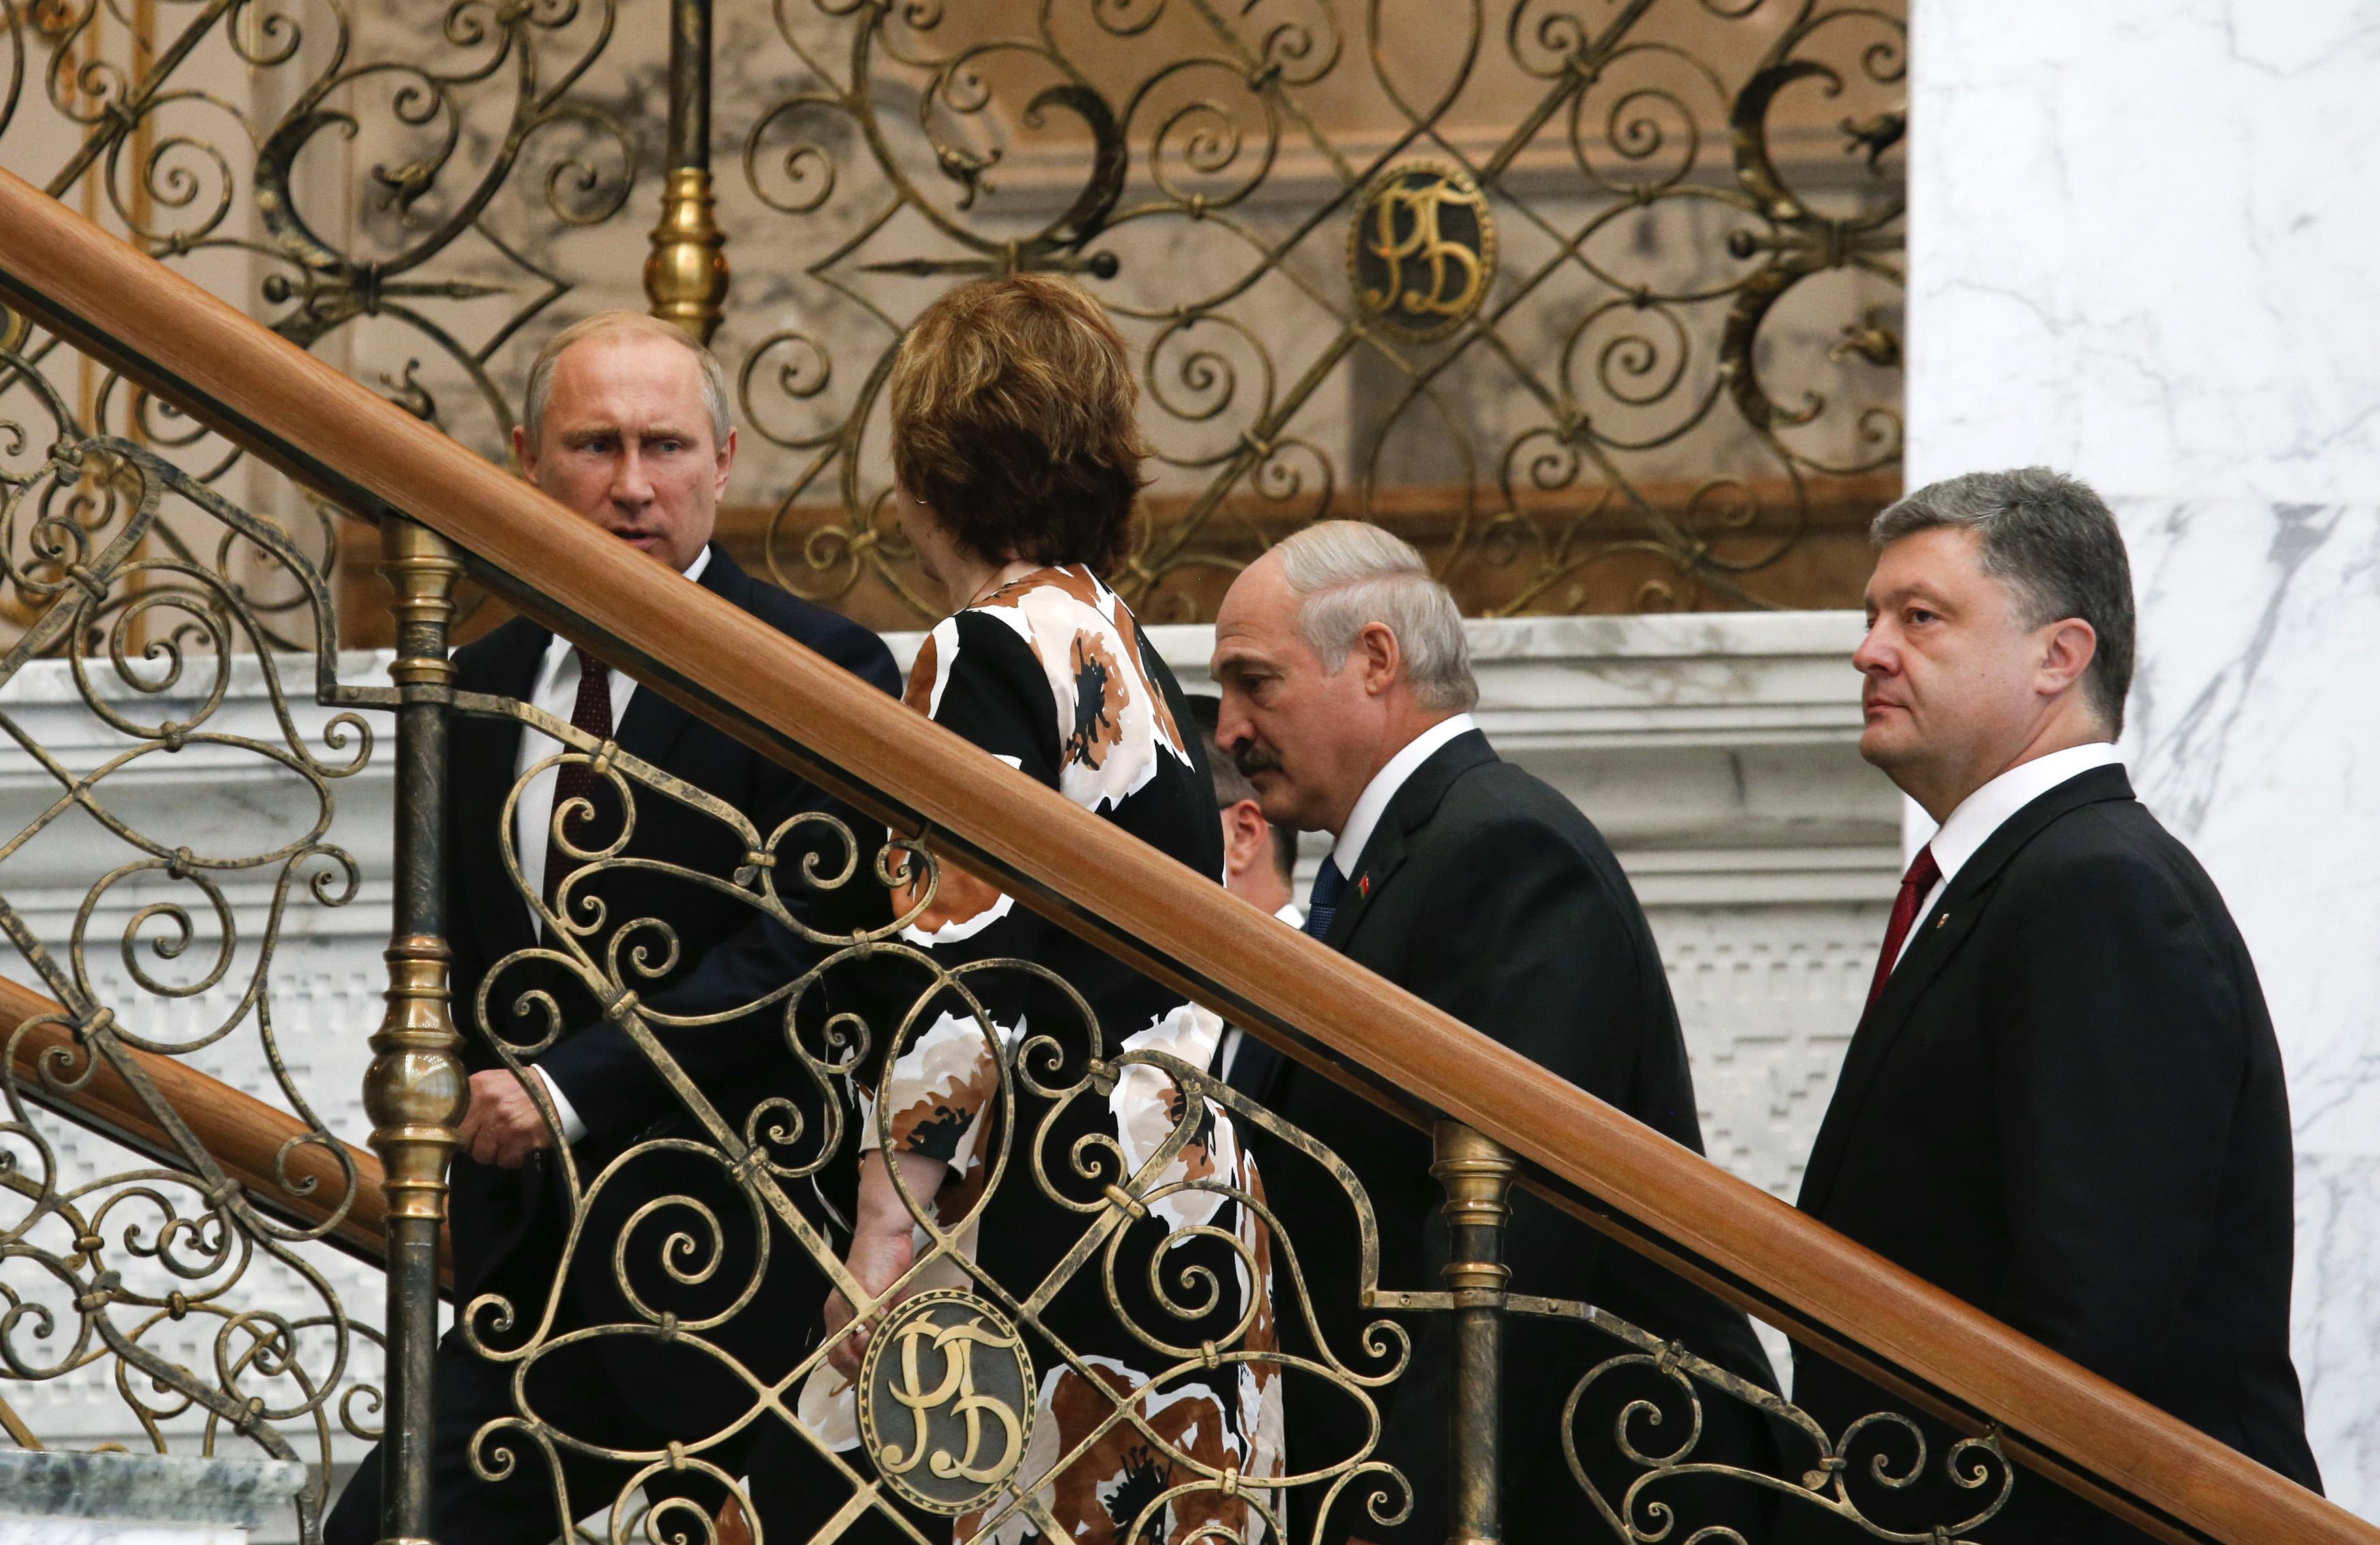 Встреча президентов в Минске, иллюстрация